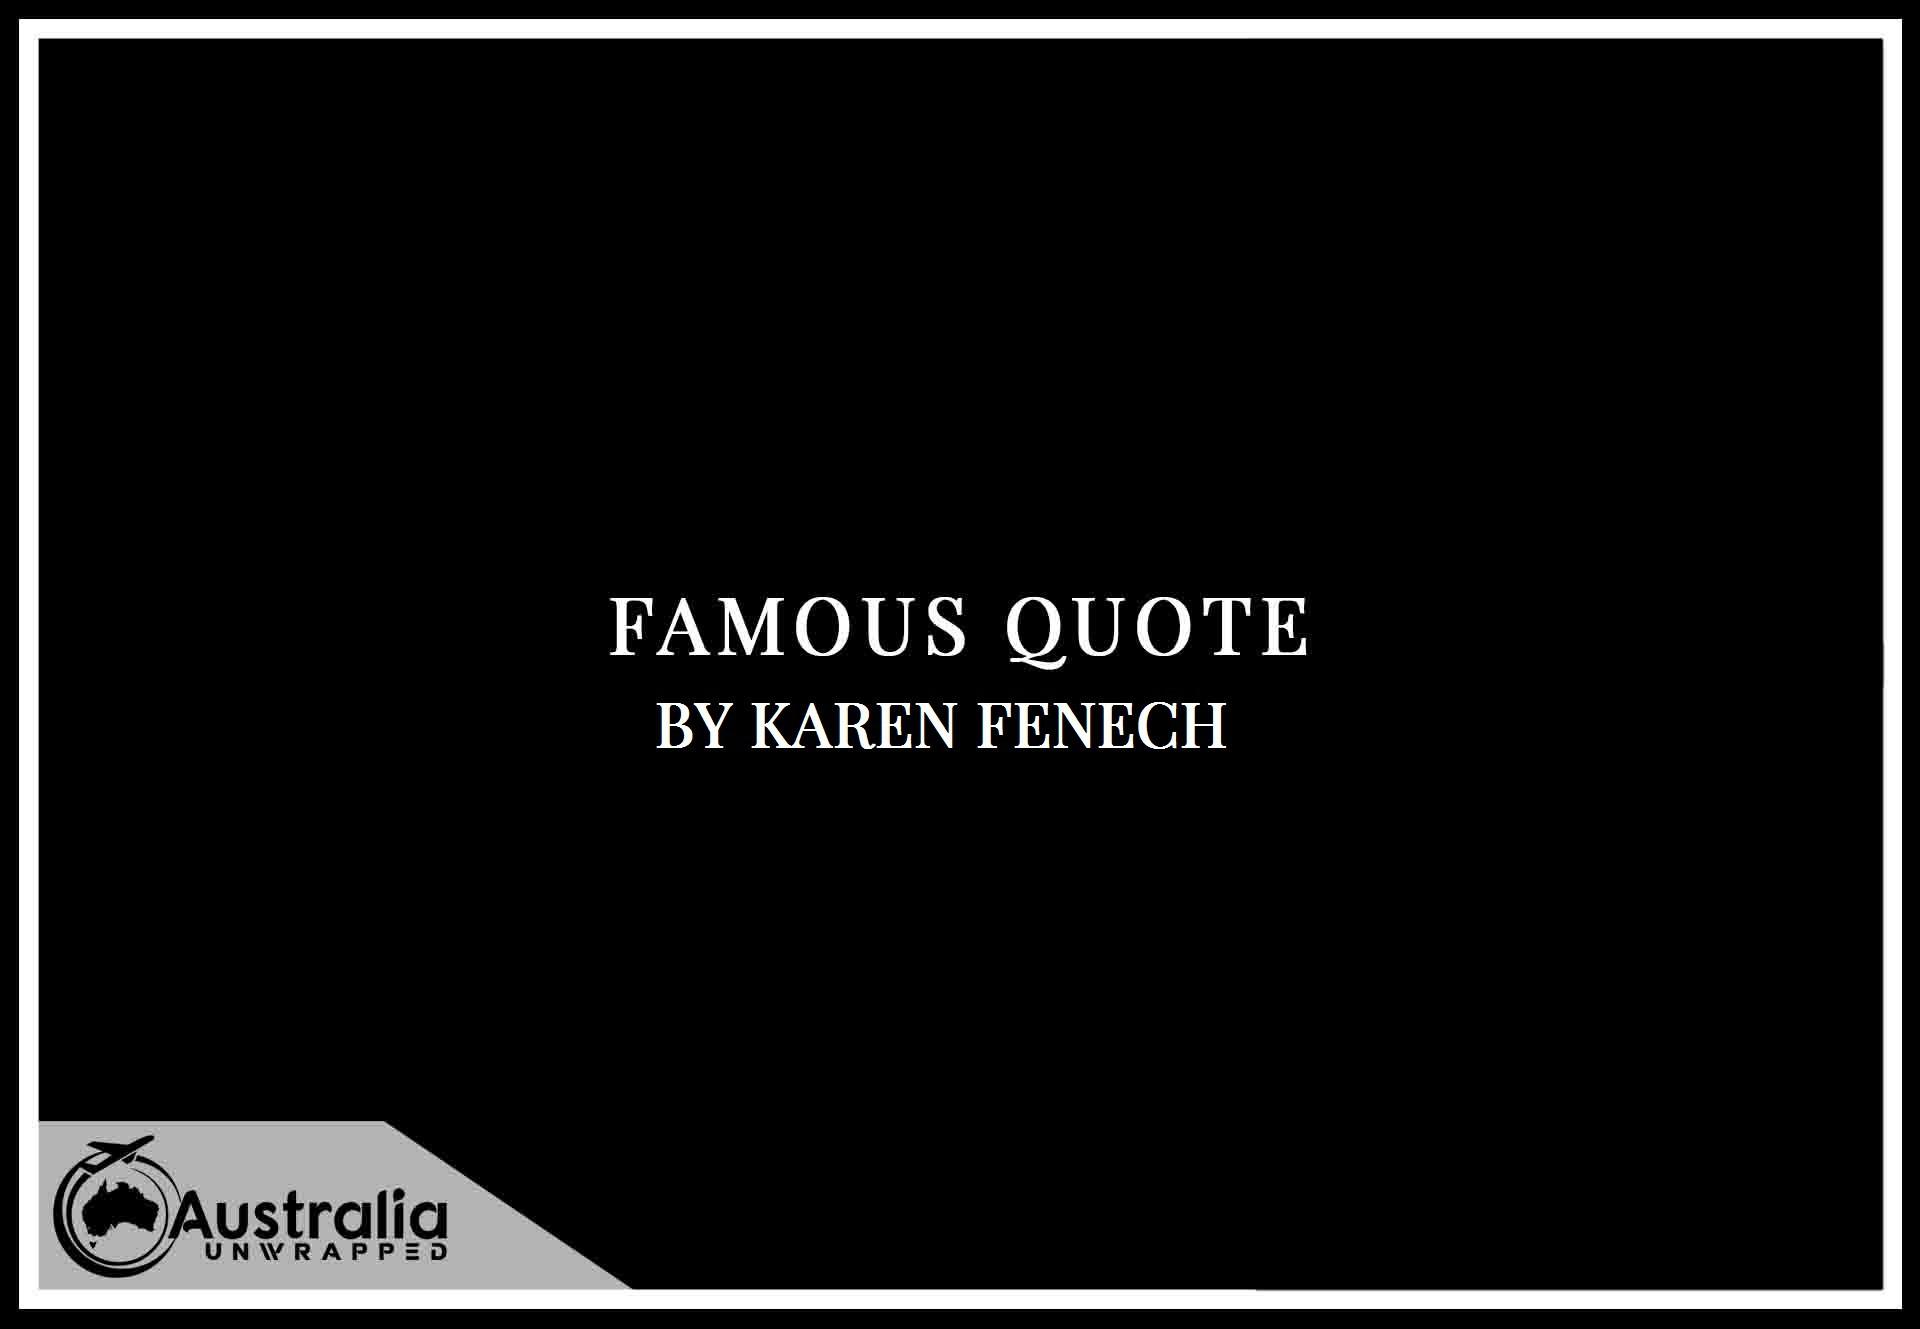 Karen Fenech's Top 1 Popular and Famous Quotes